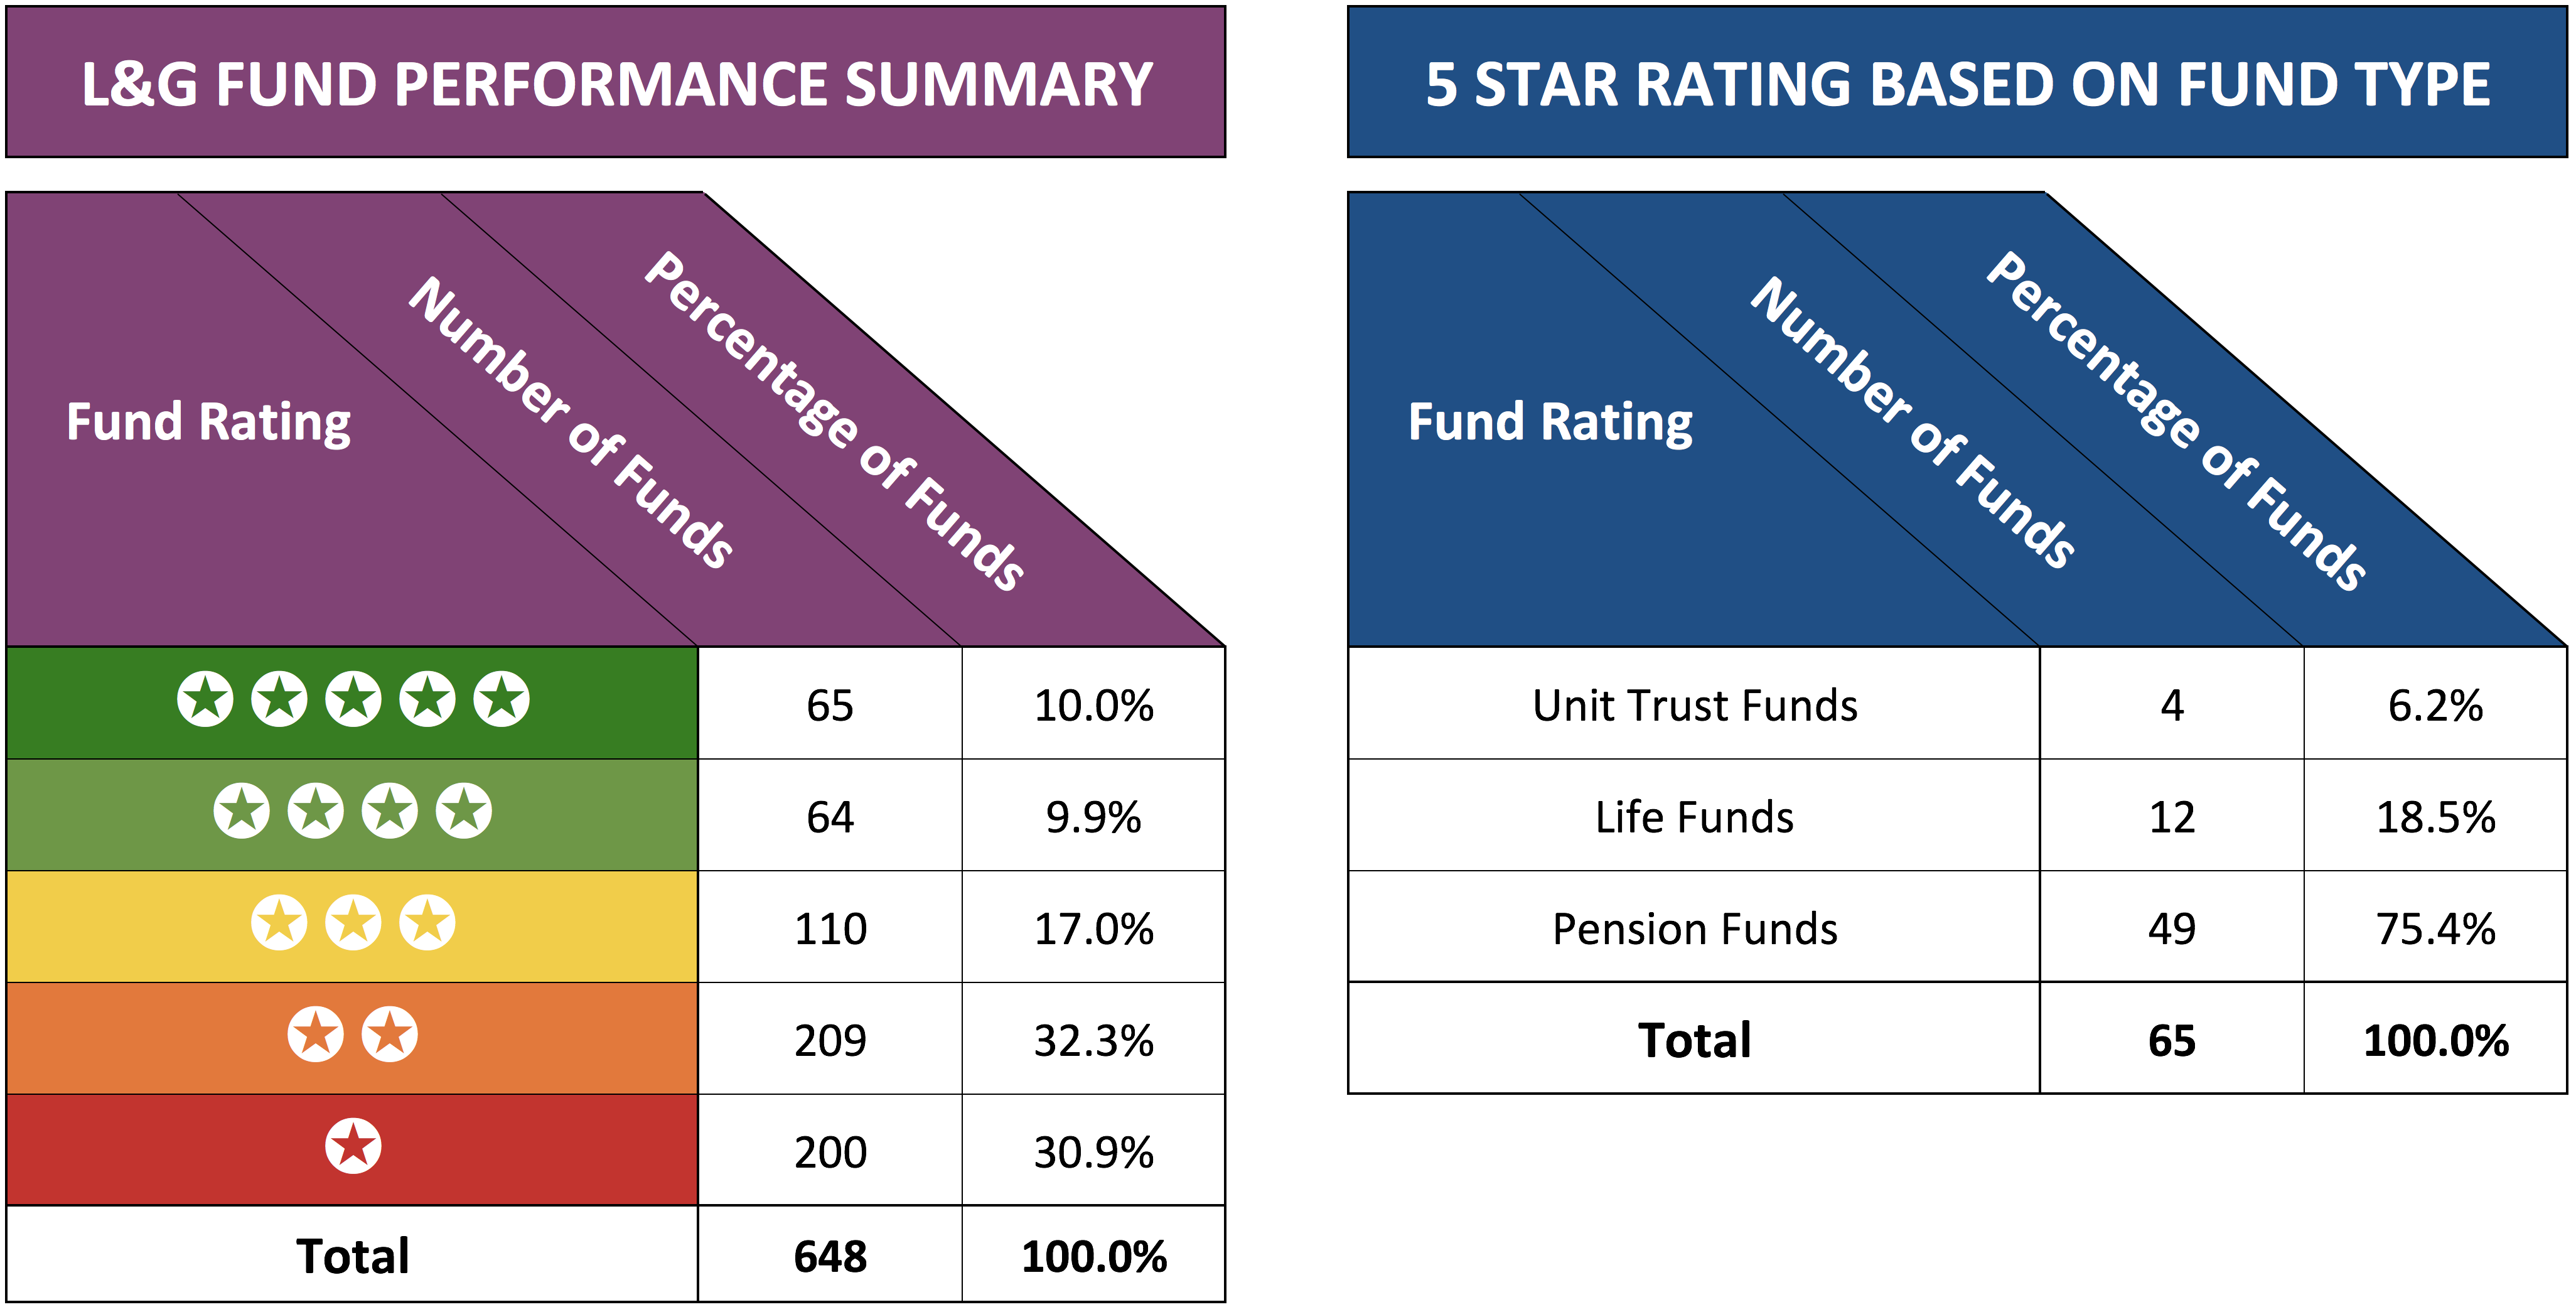 L&G Fund performance summary